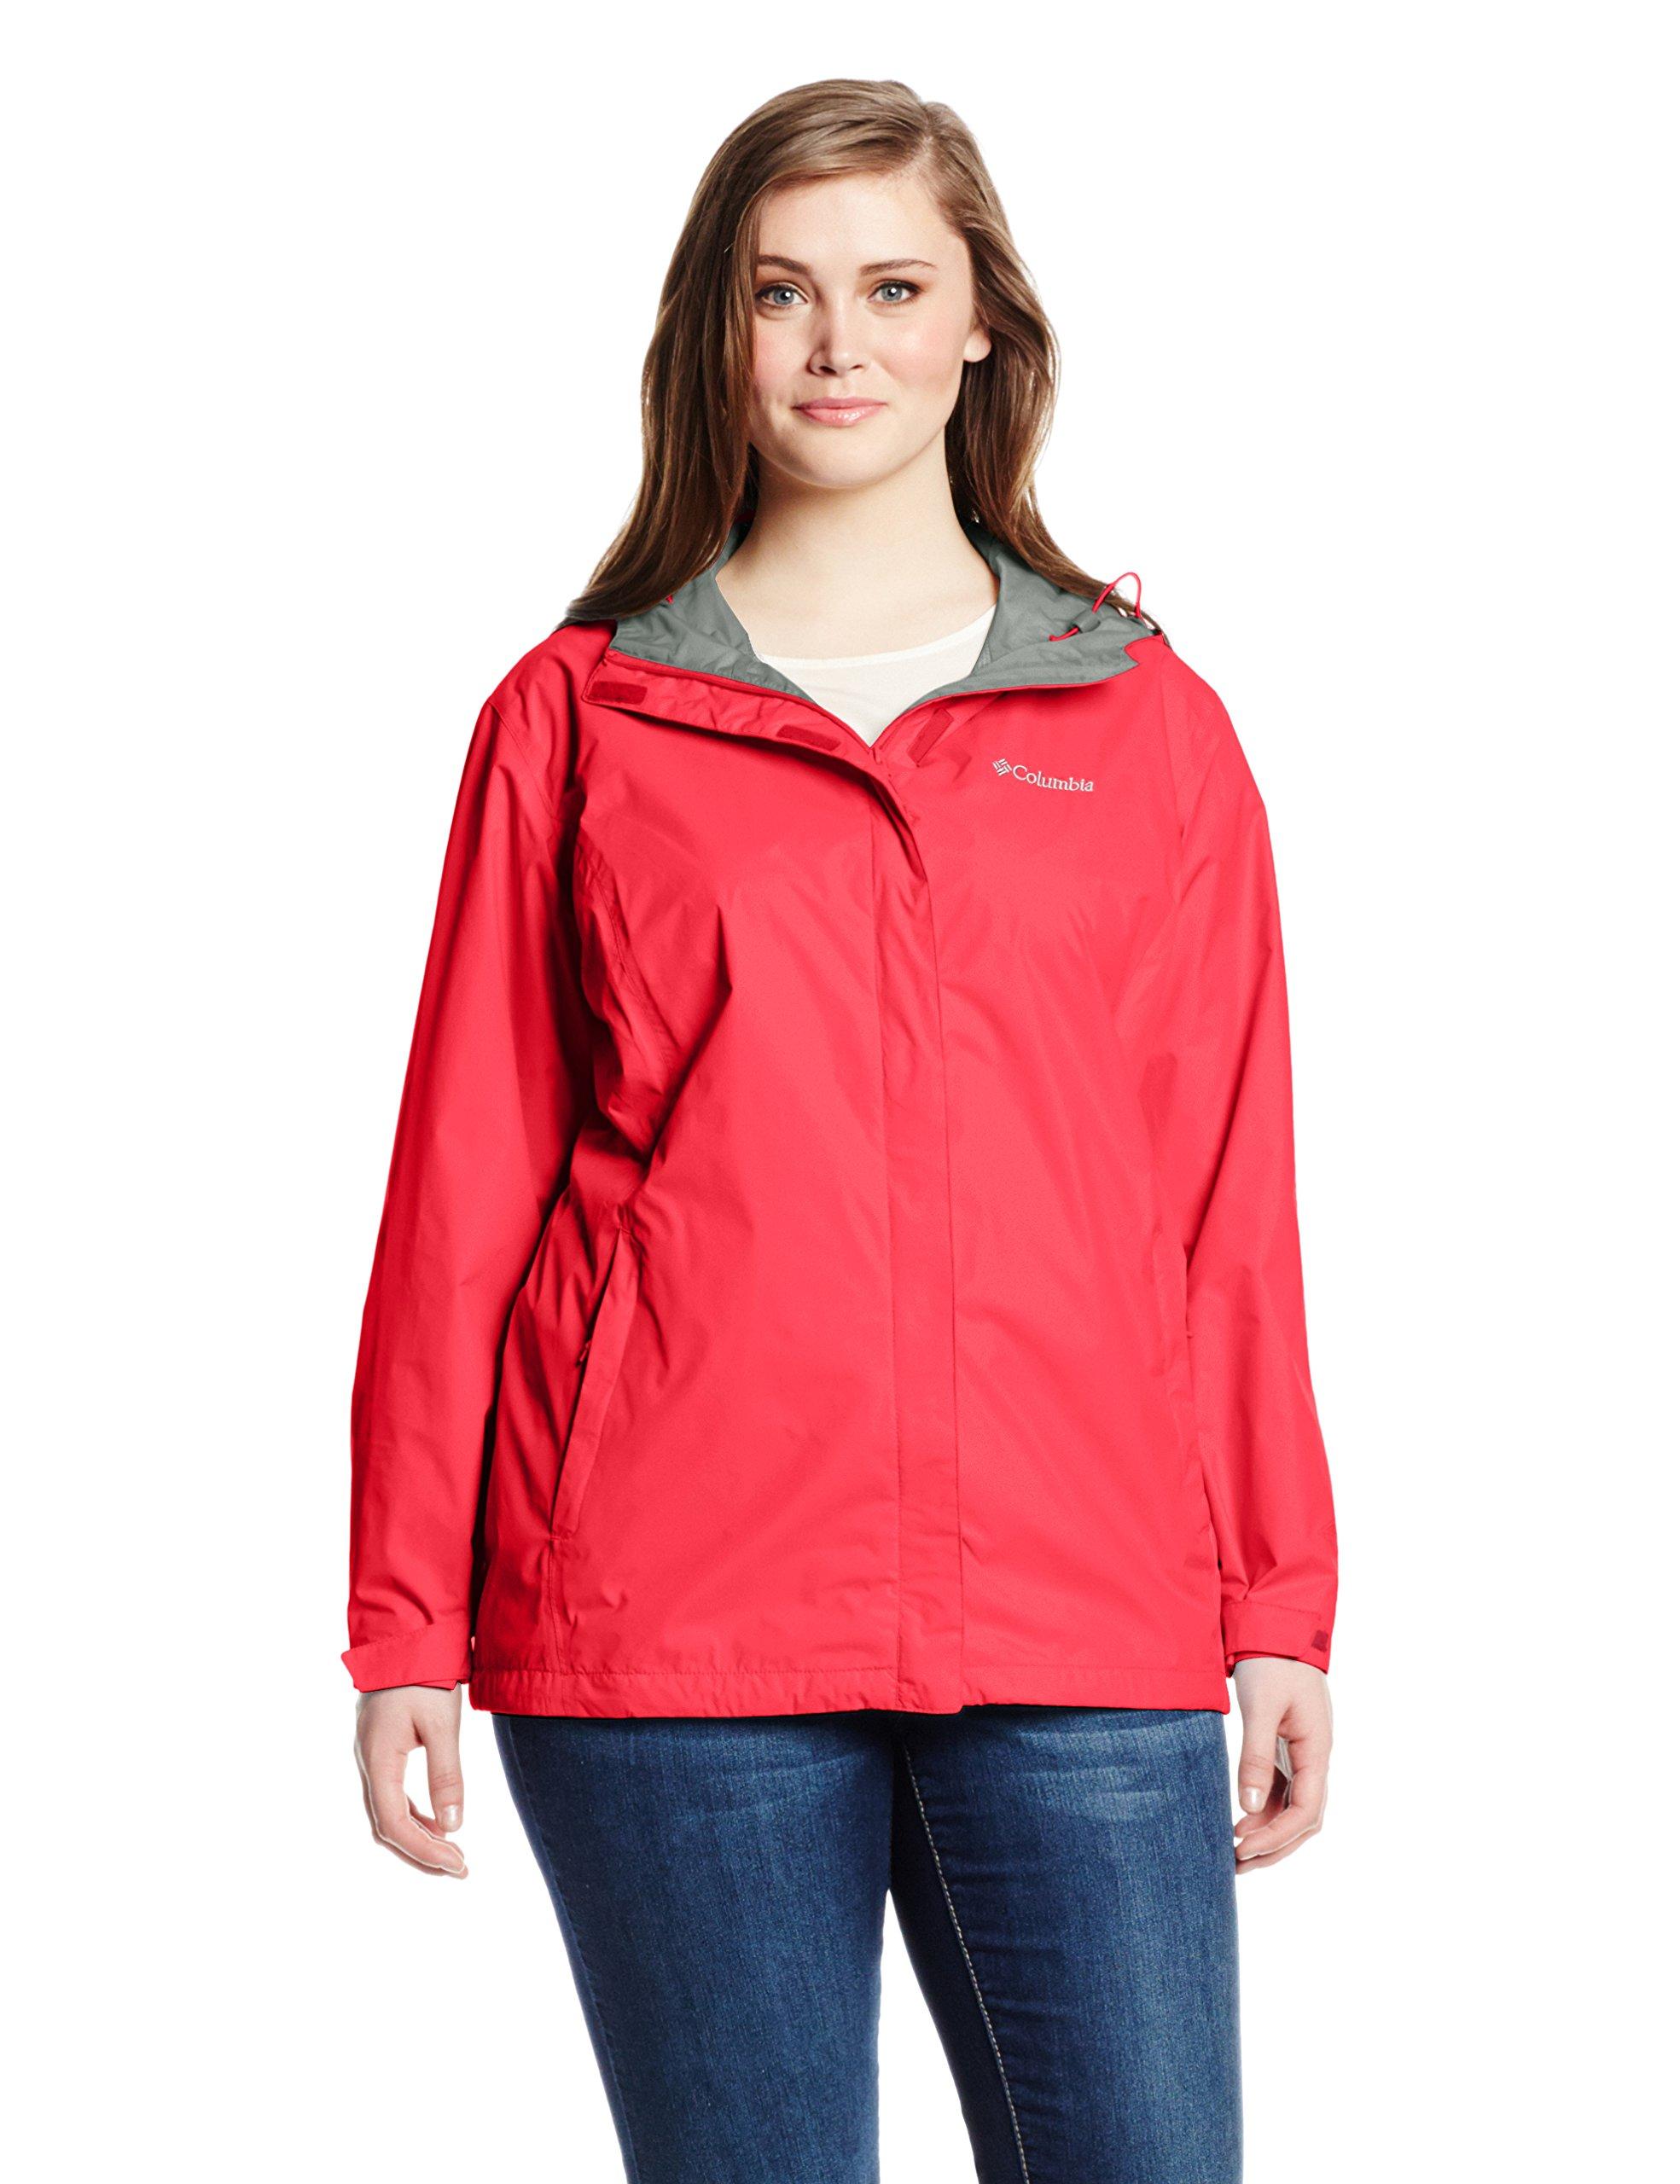 Columbia Women's Plus Size Arcadia II Jacket, Red Camellia, 3X